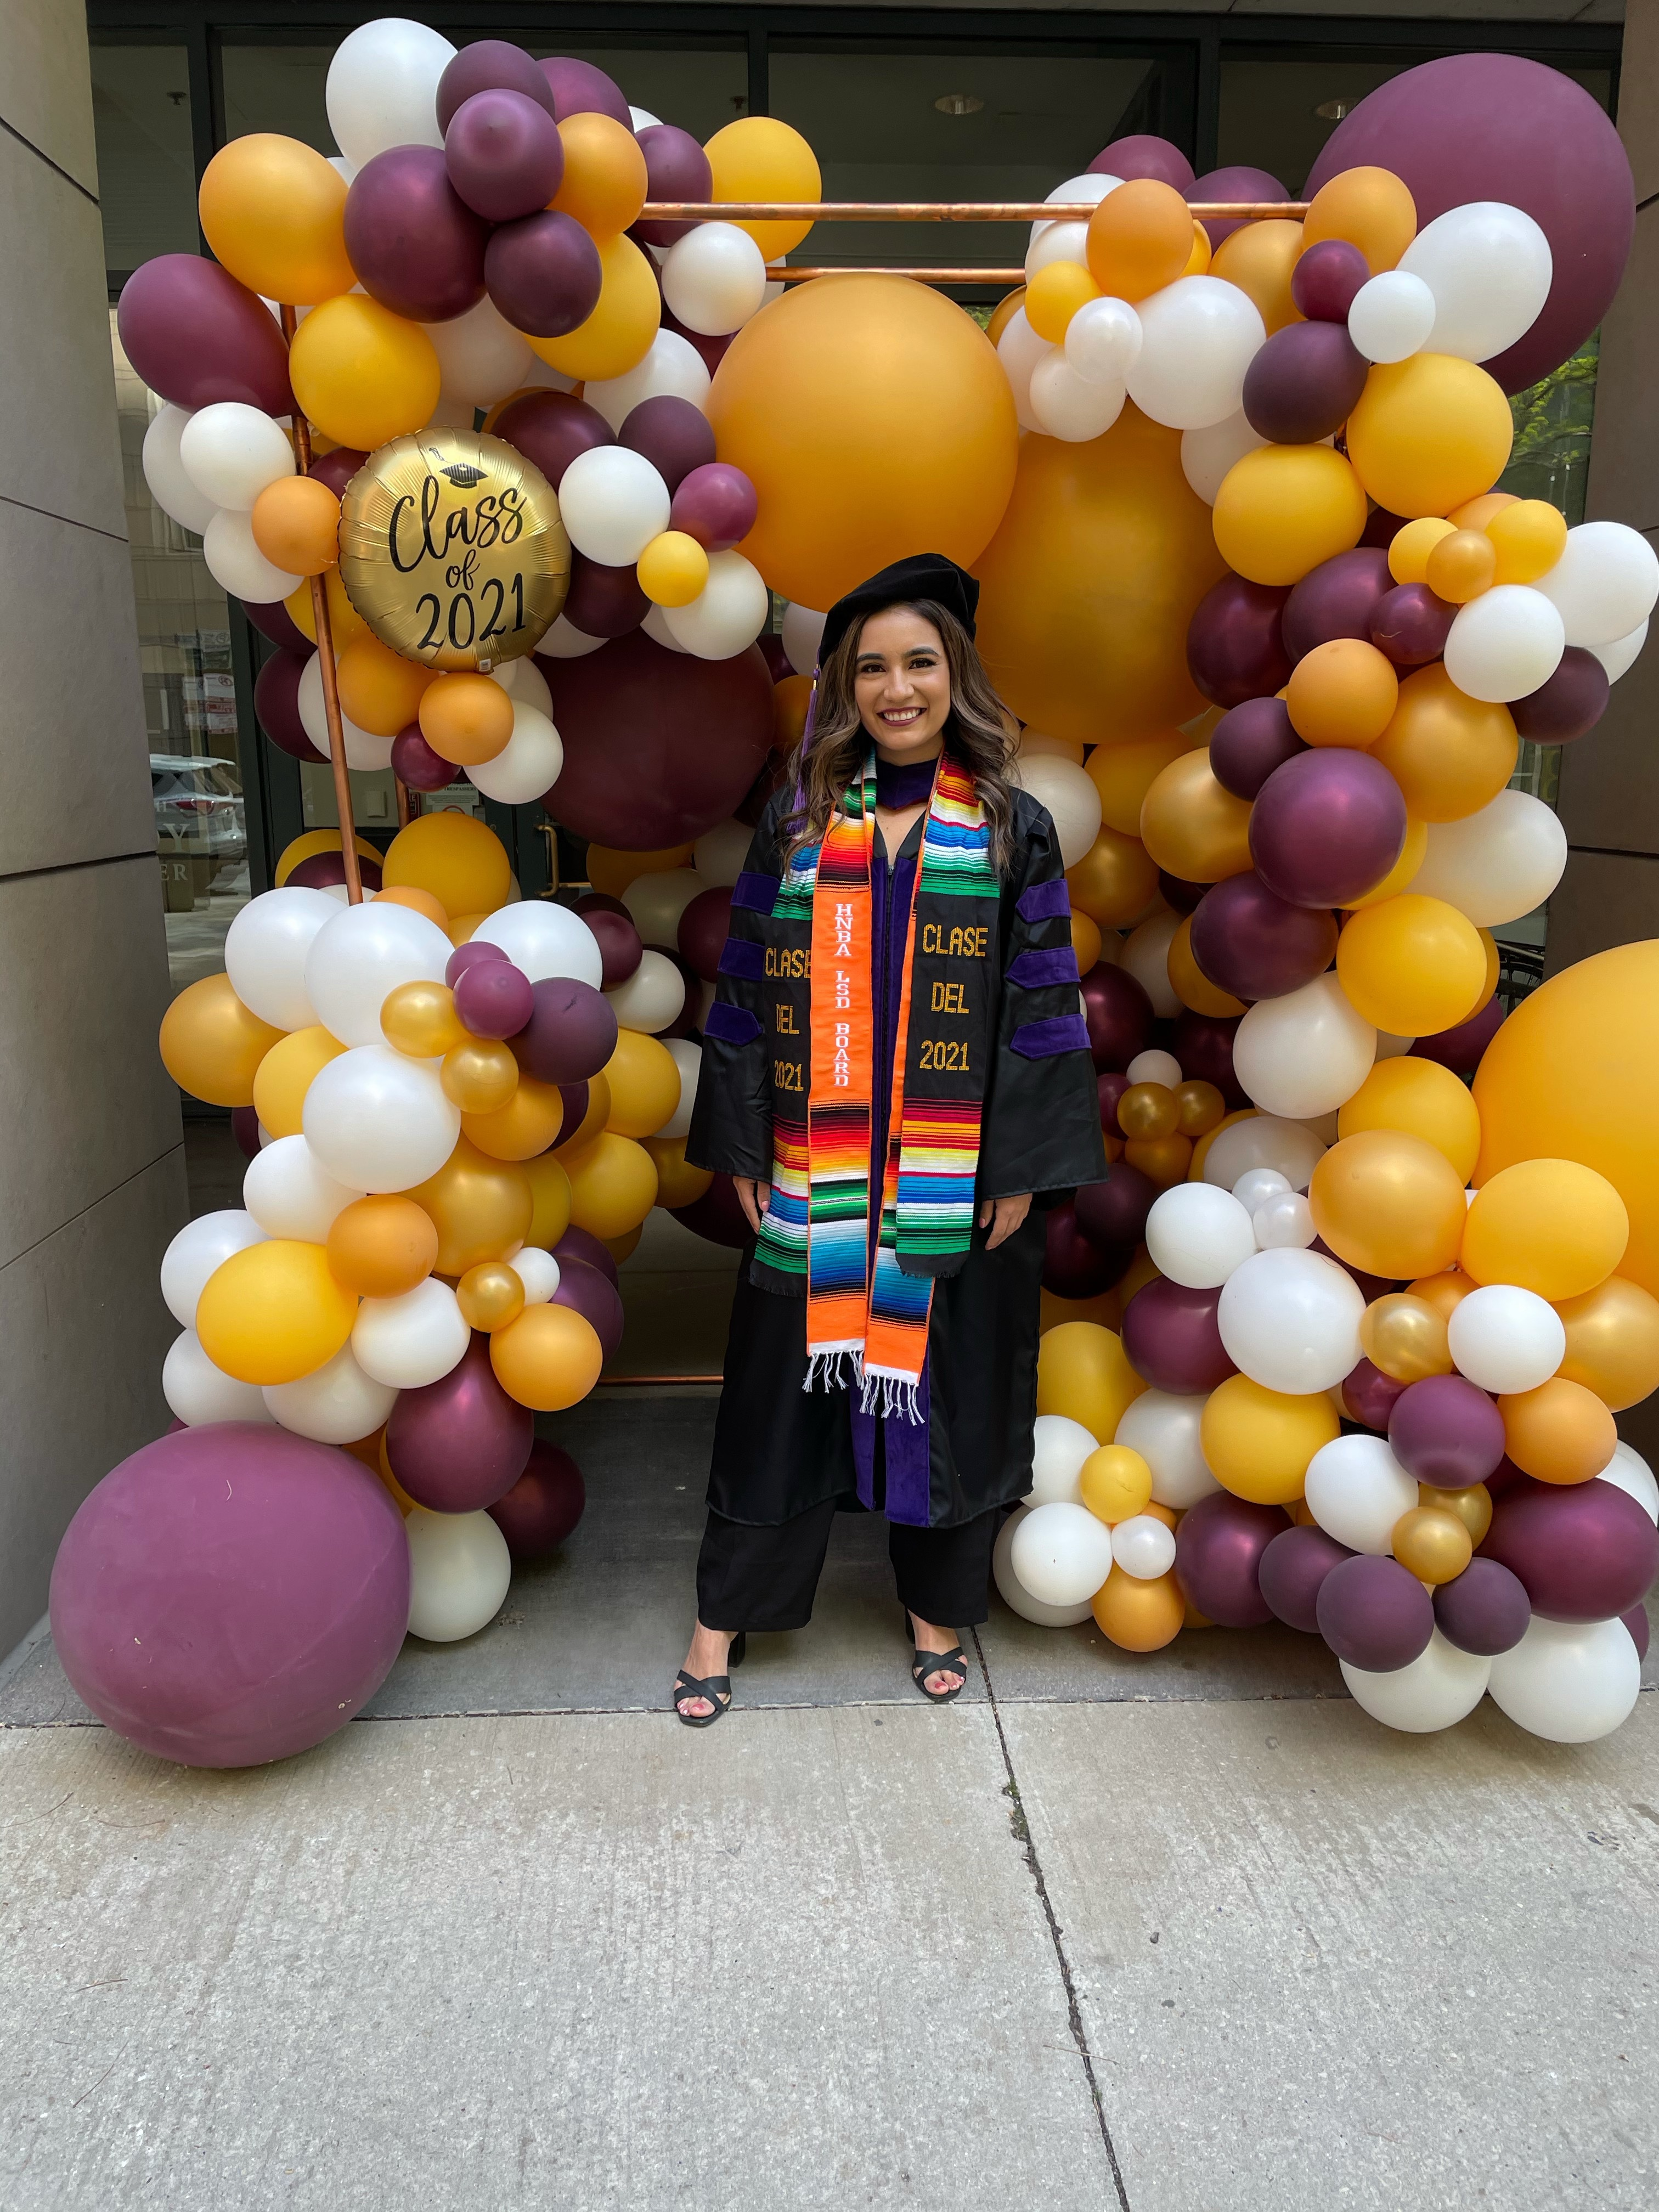 Daihana Estrada graduated in May from Loyola University Chicago School of Law.